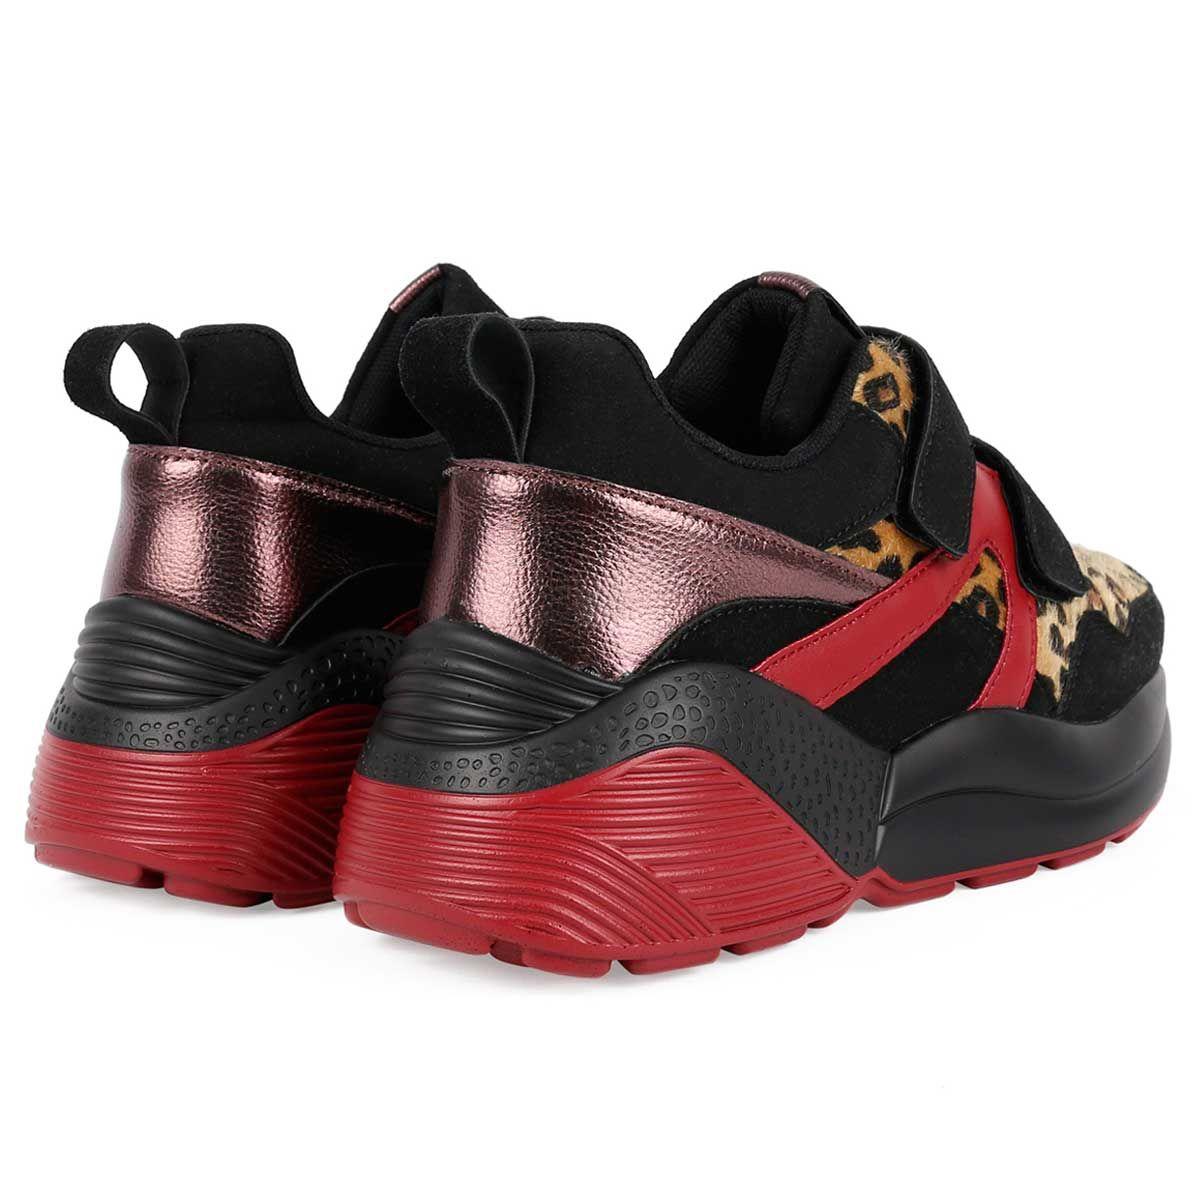 Montevita Chunky Sneaker in Multicolour